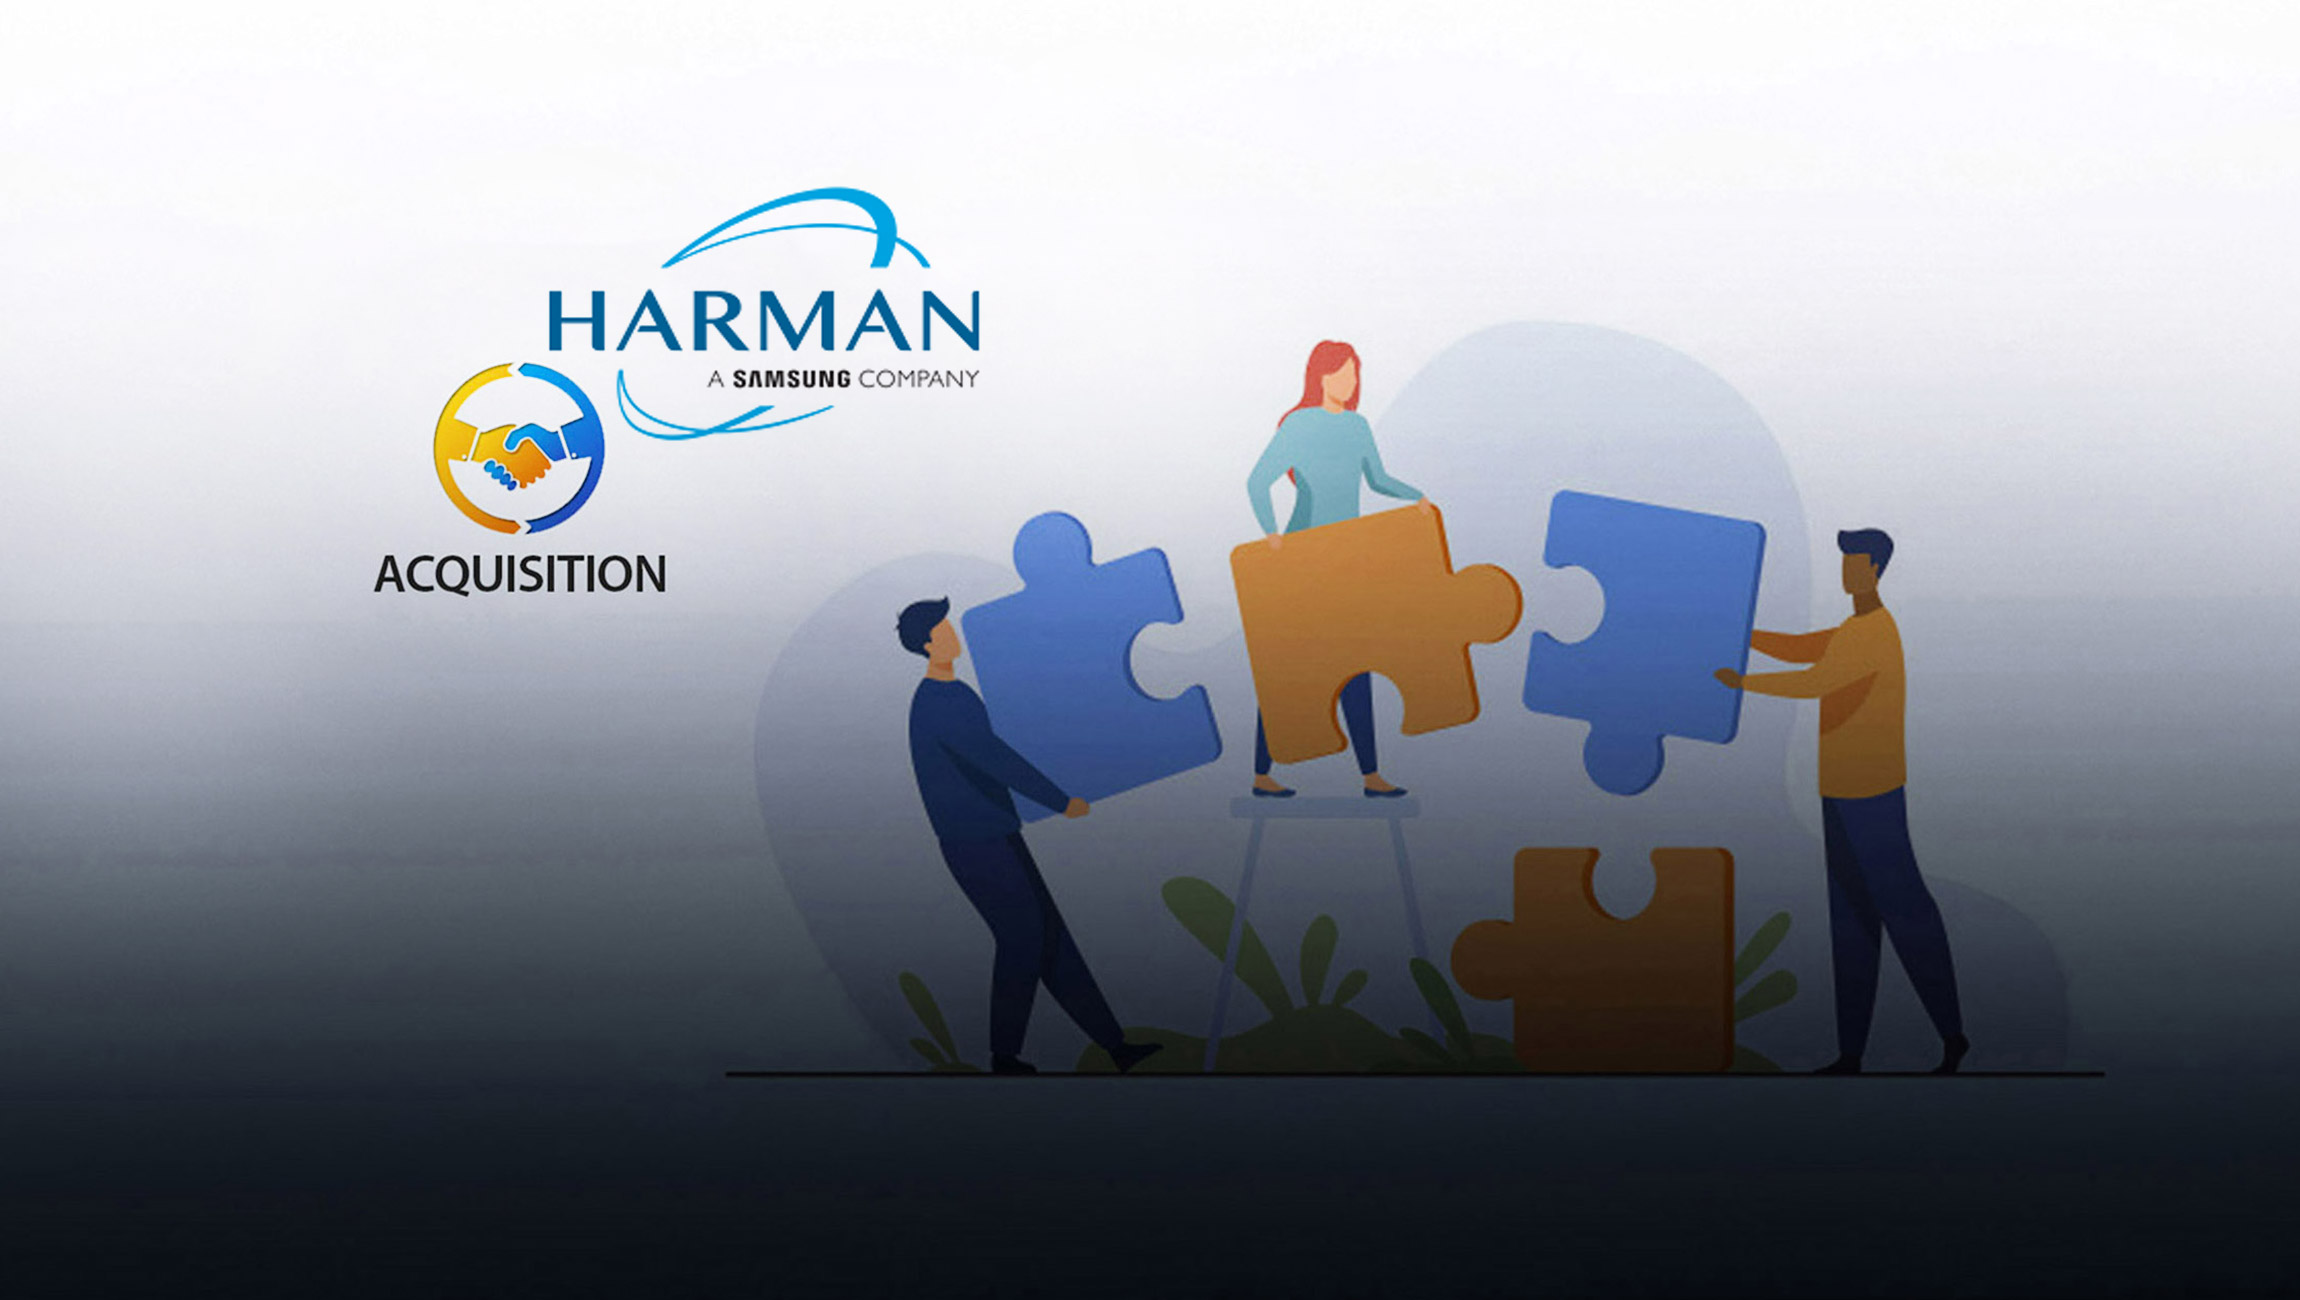 HARMAN Acquires 5G Edge And V2X Leader Savari